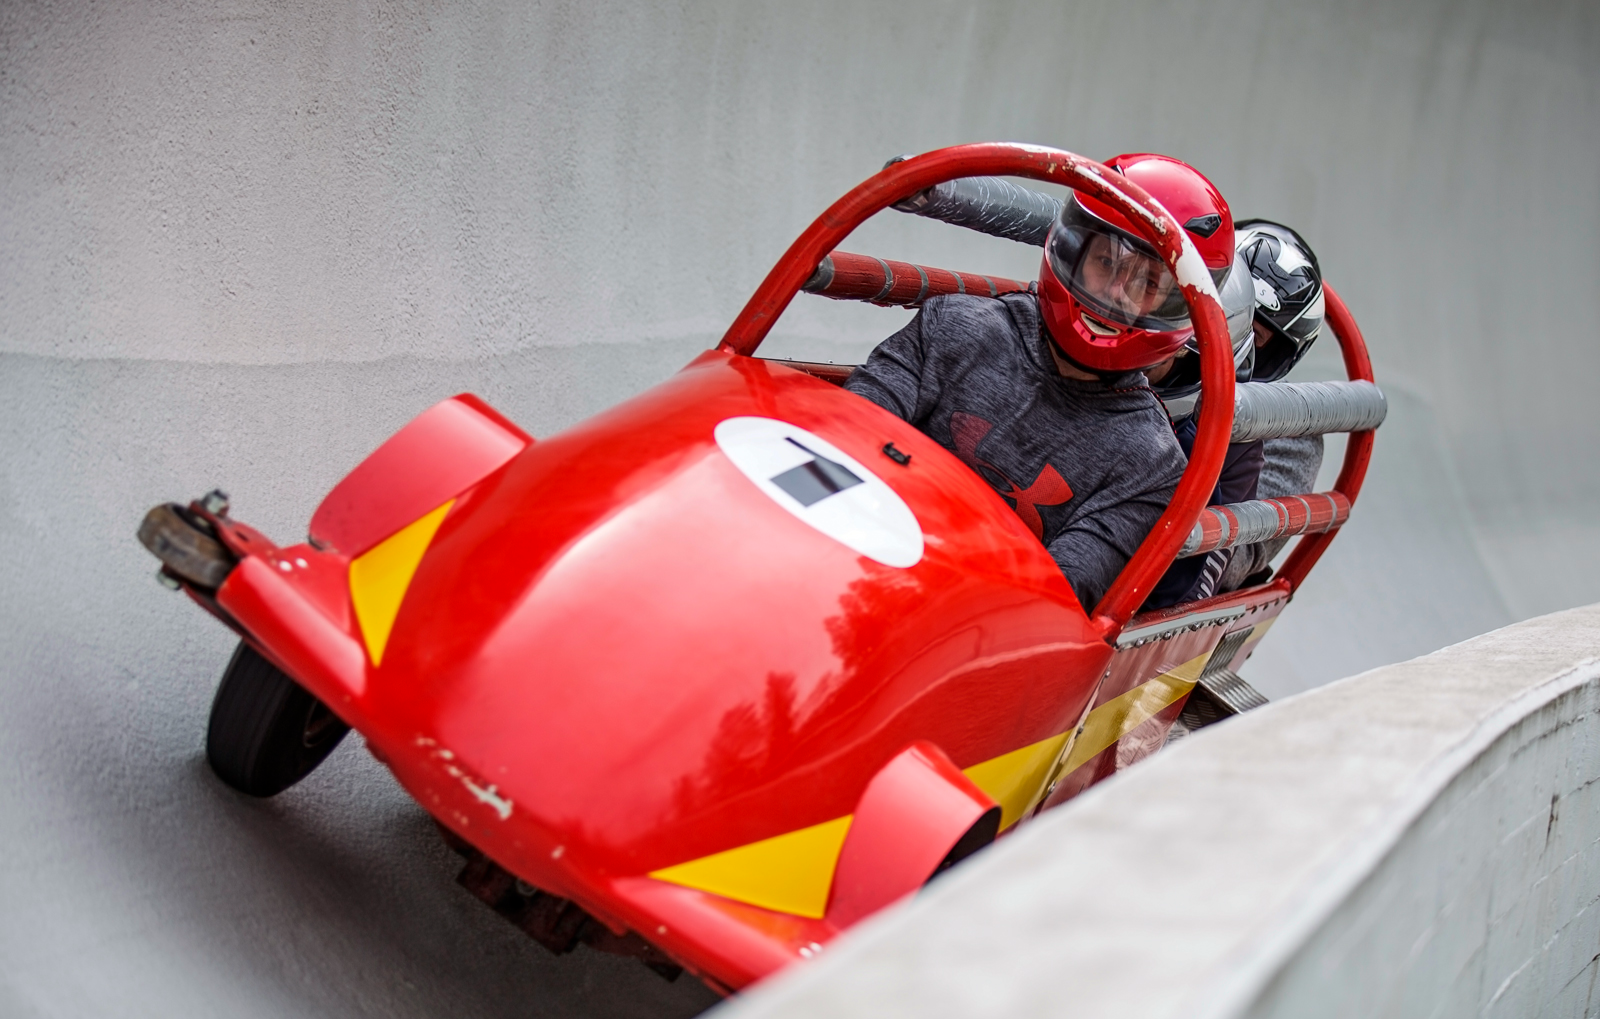 bobfahren-igls-bg1